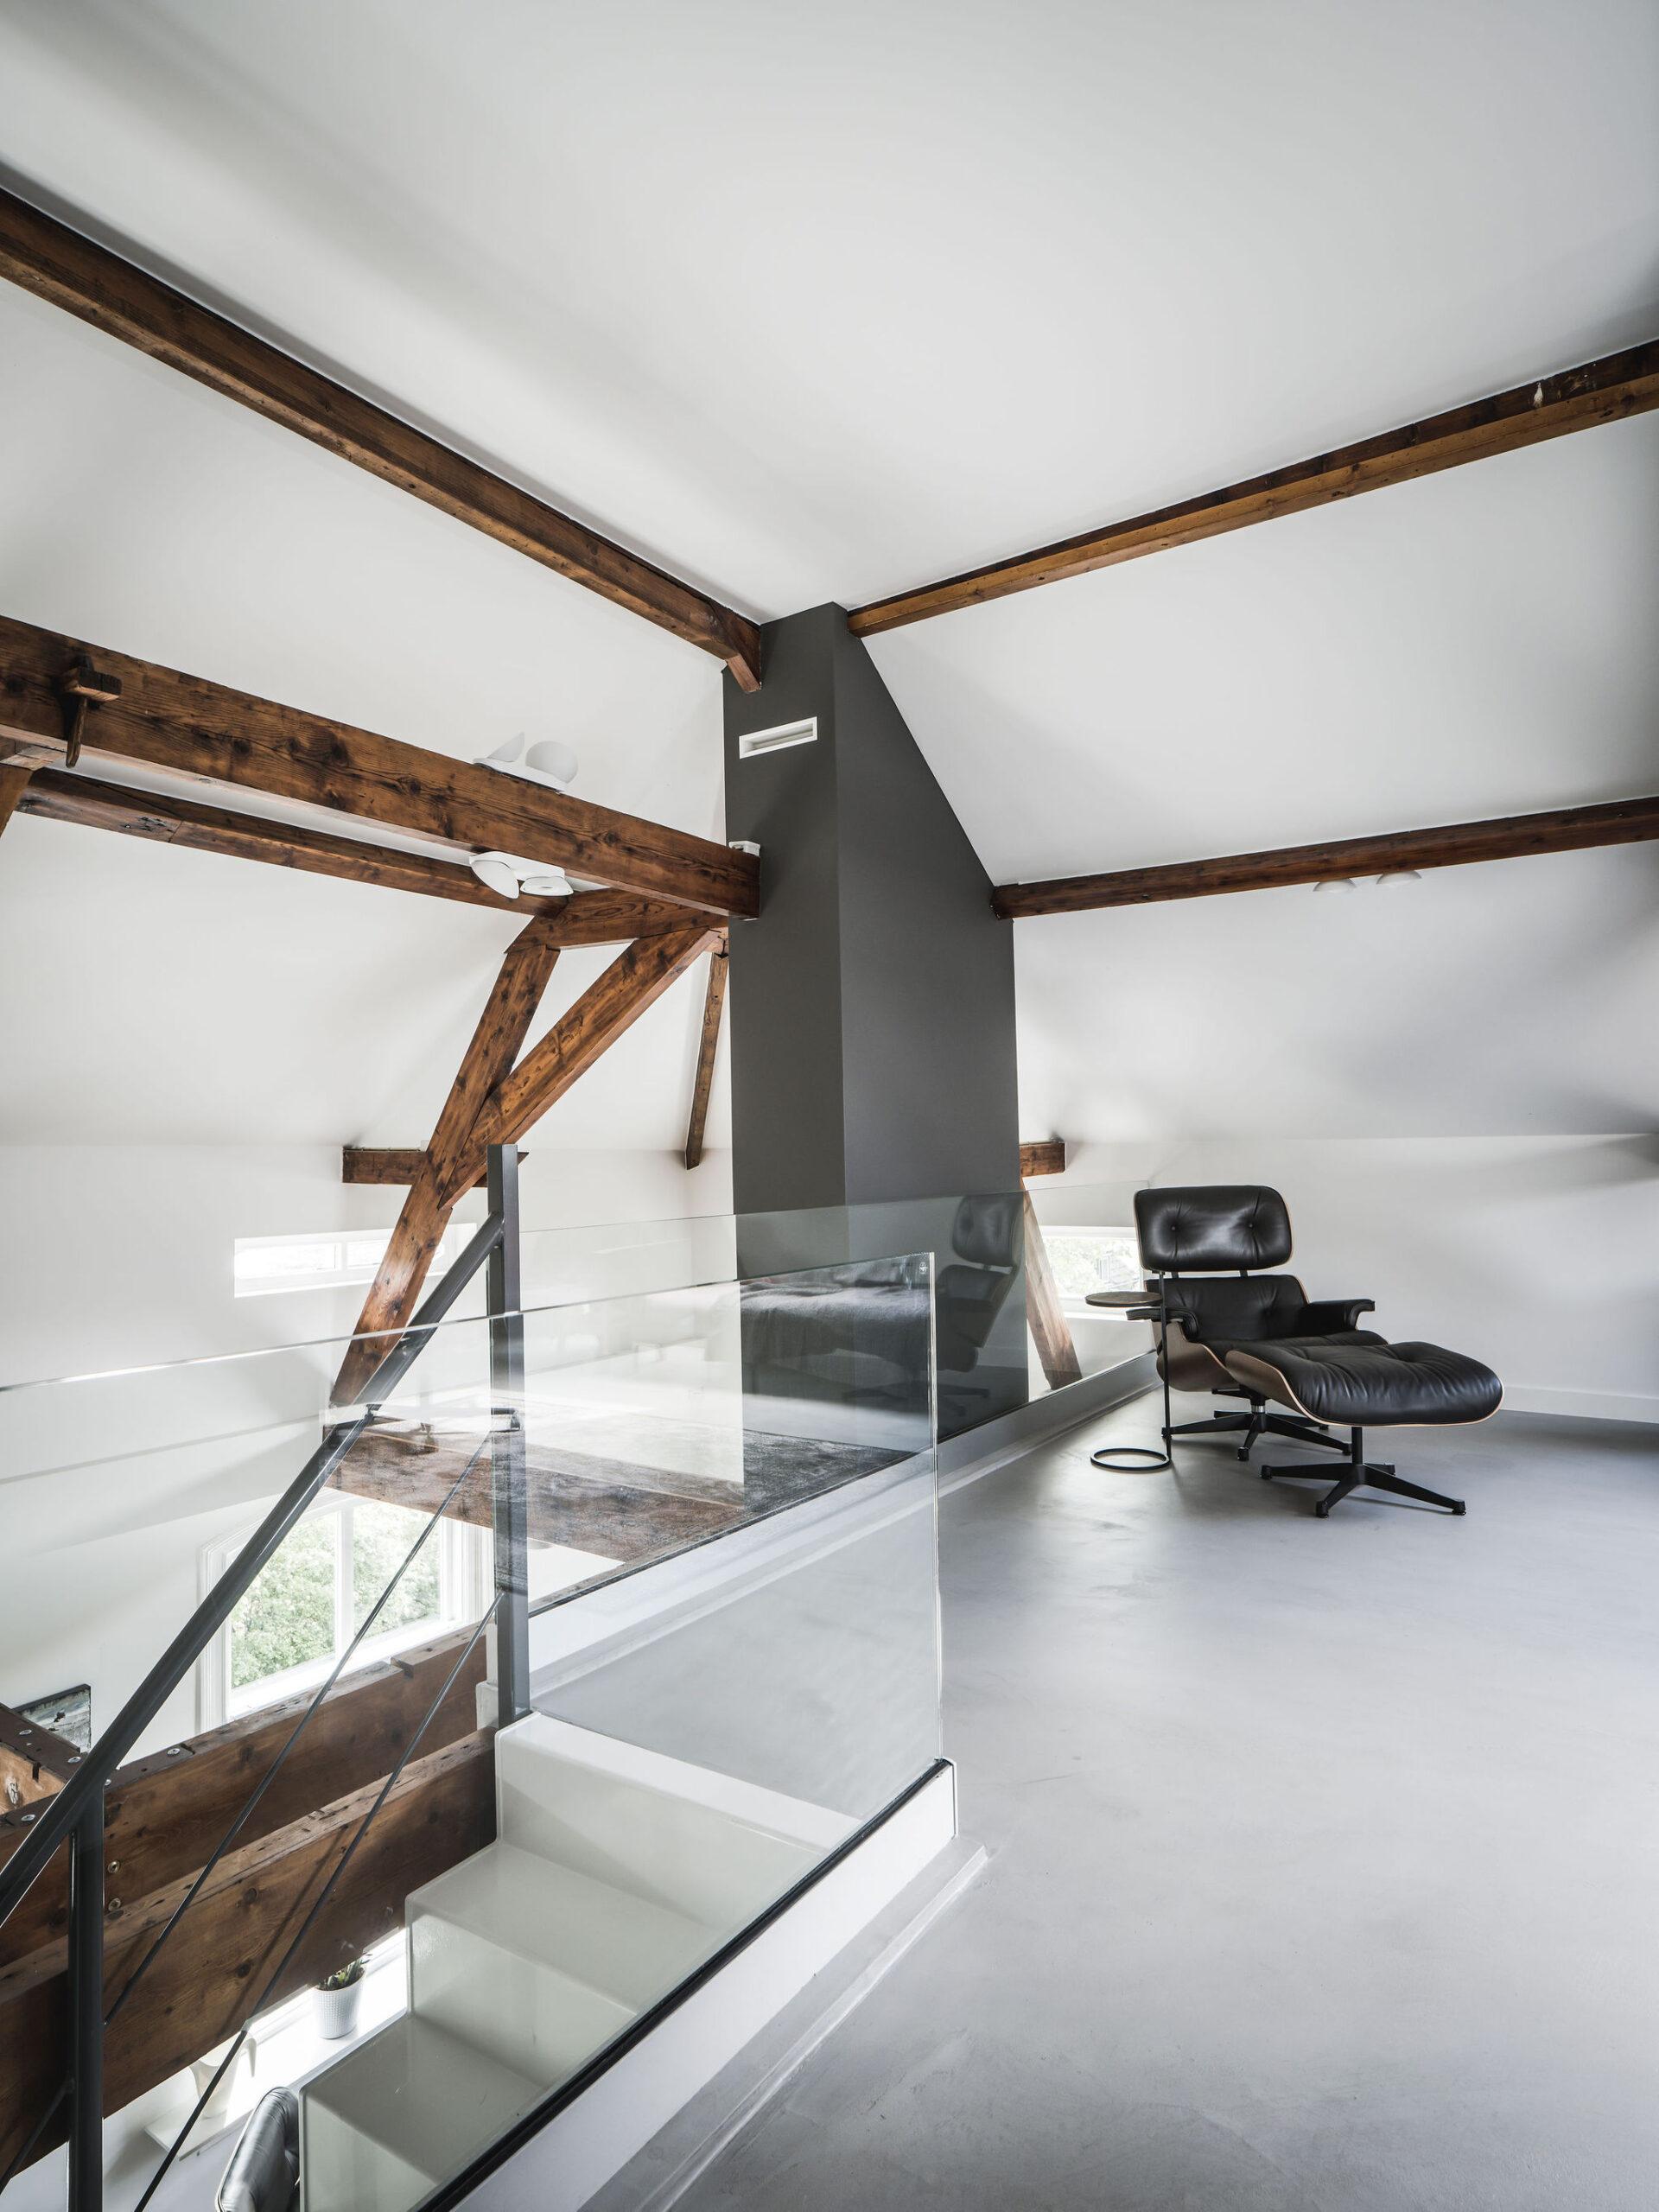 interieurarchitect-Stan-Wildenberg-interieur-interiordesign-luxurylifestyle-luxuryinteriors-luxuryhomes-vide-trap-glasballustrade-Peter-Baas-Photography-